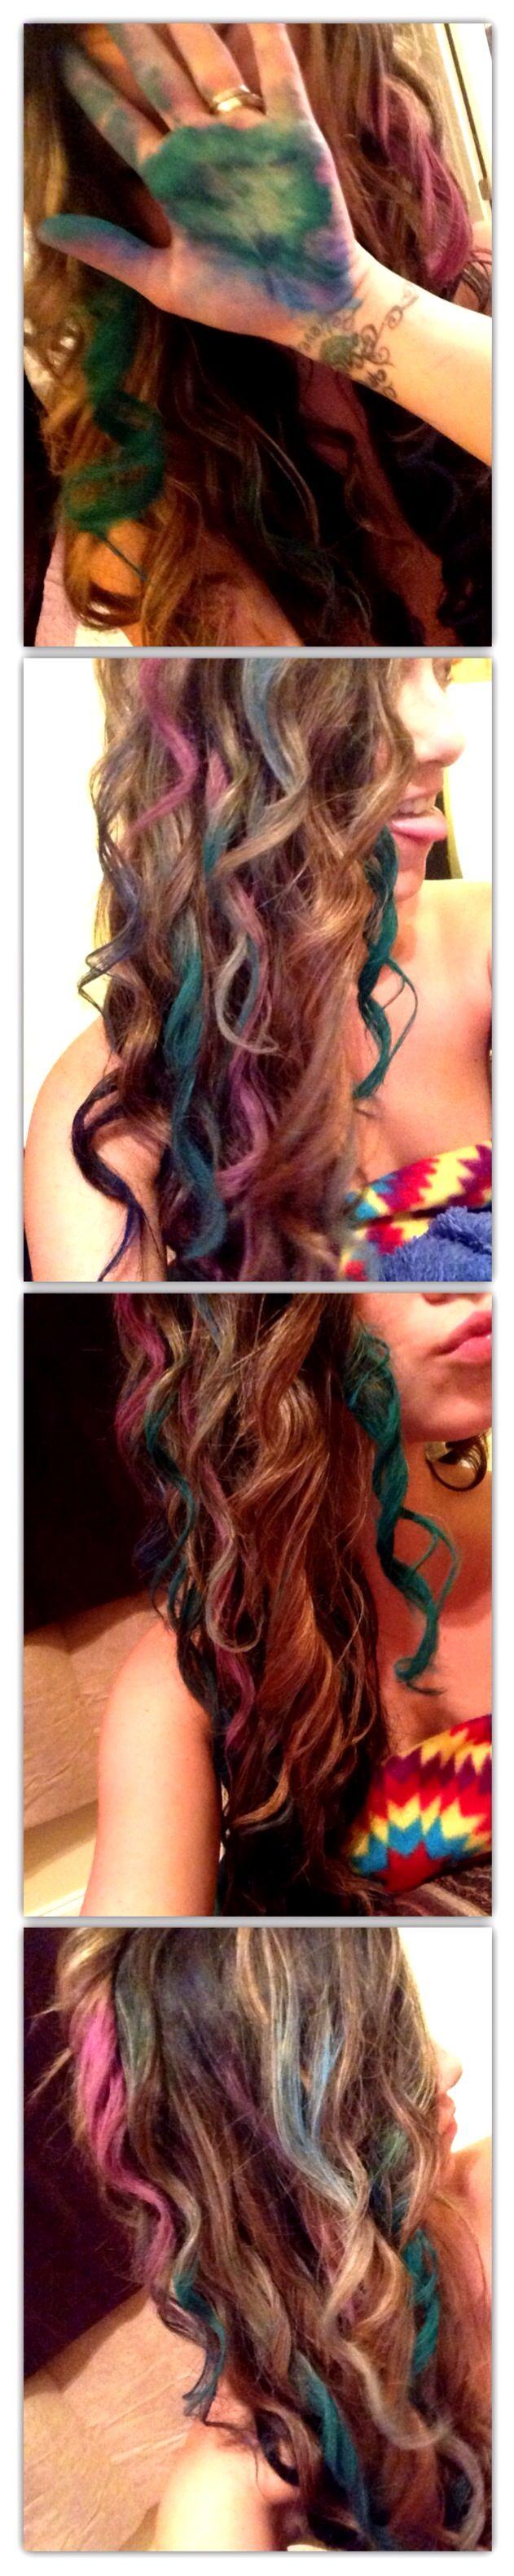 hair colors at sallys temporary hair dye from sally s